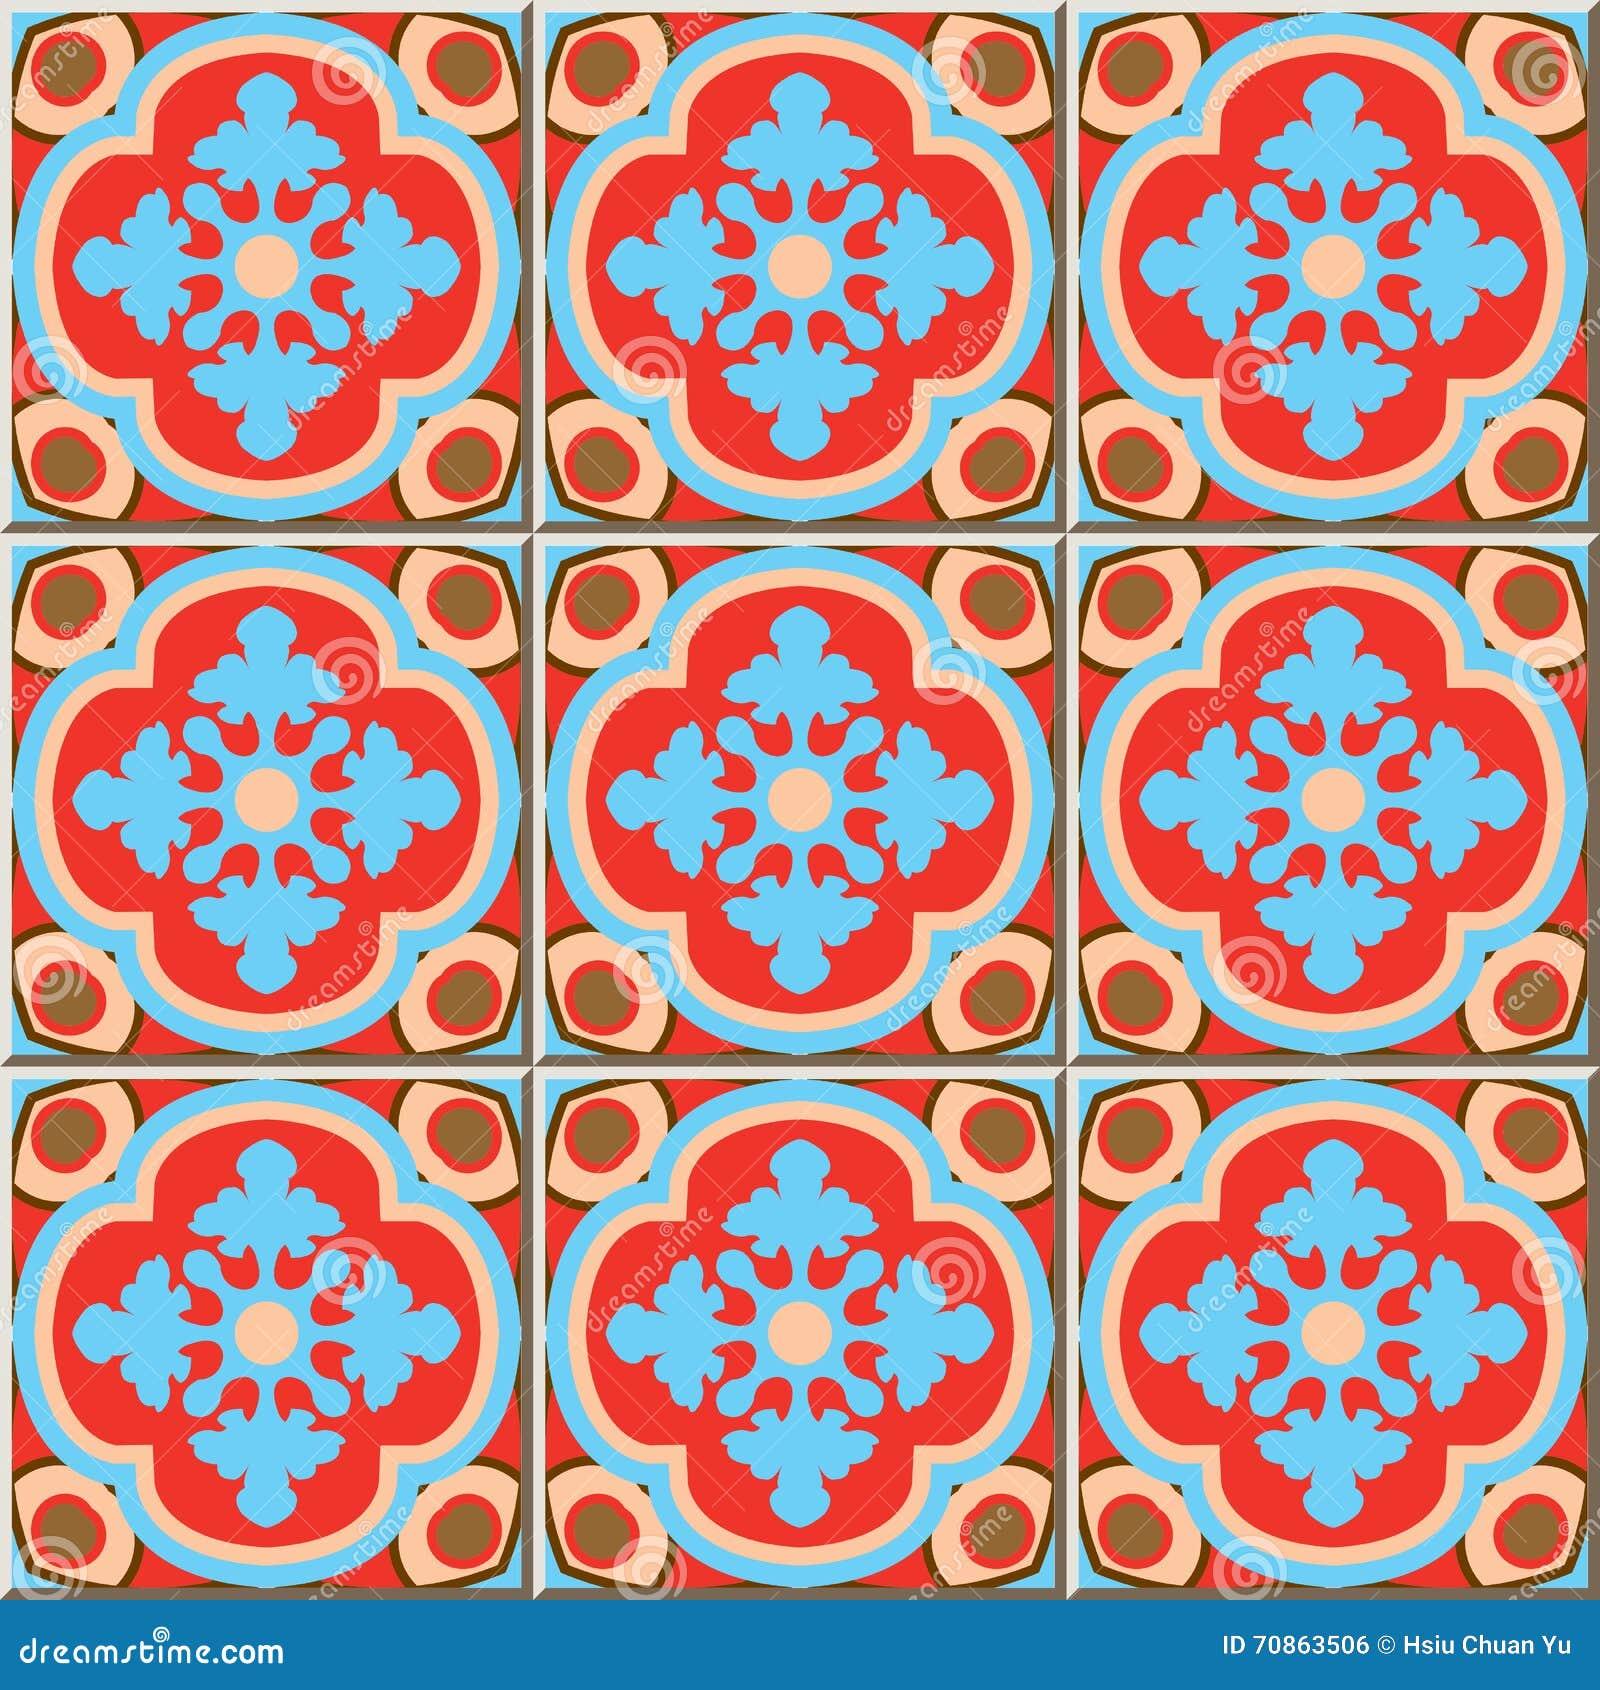 ceramic tile pattern 337 retro red blue curve cross kaleidoscope